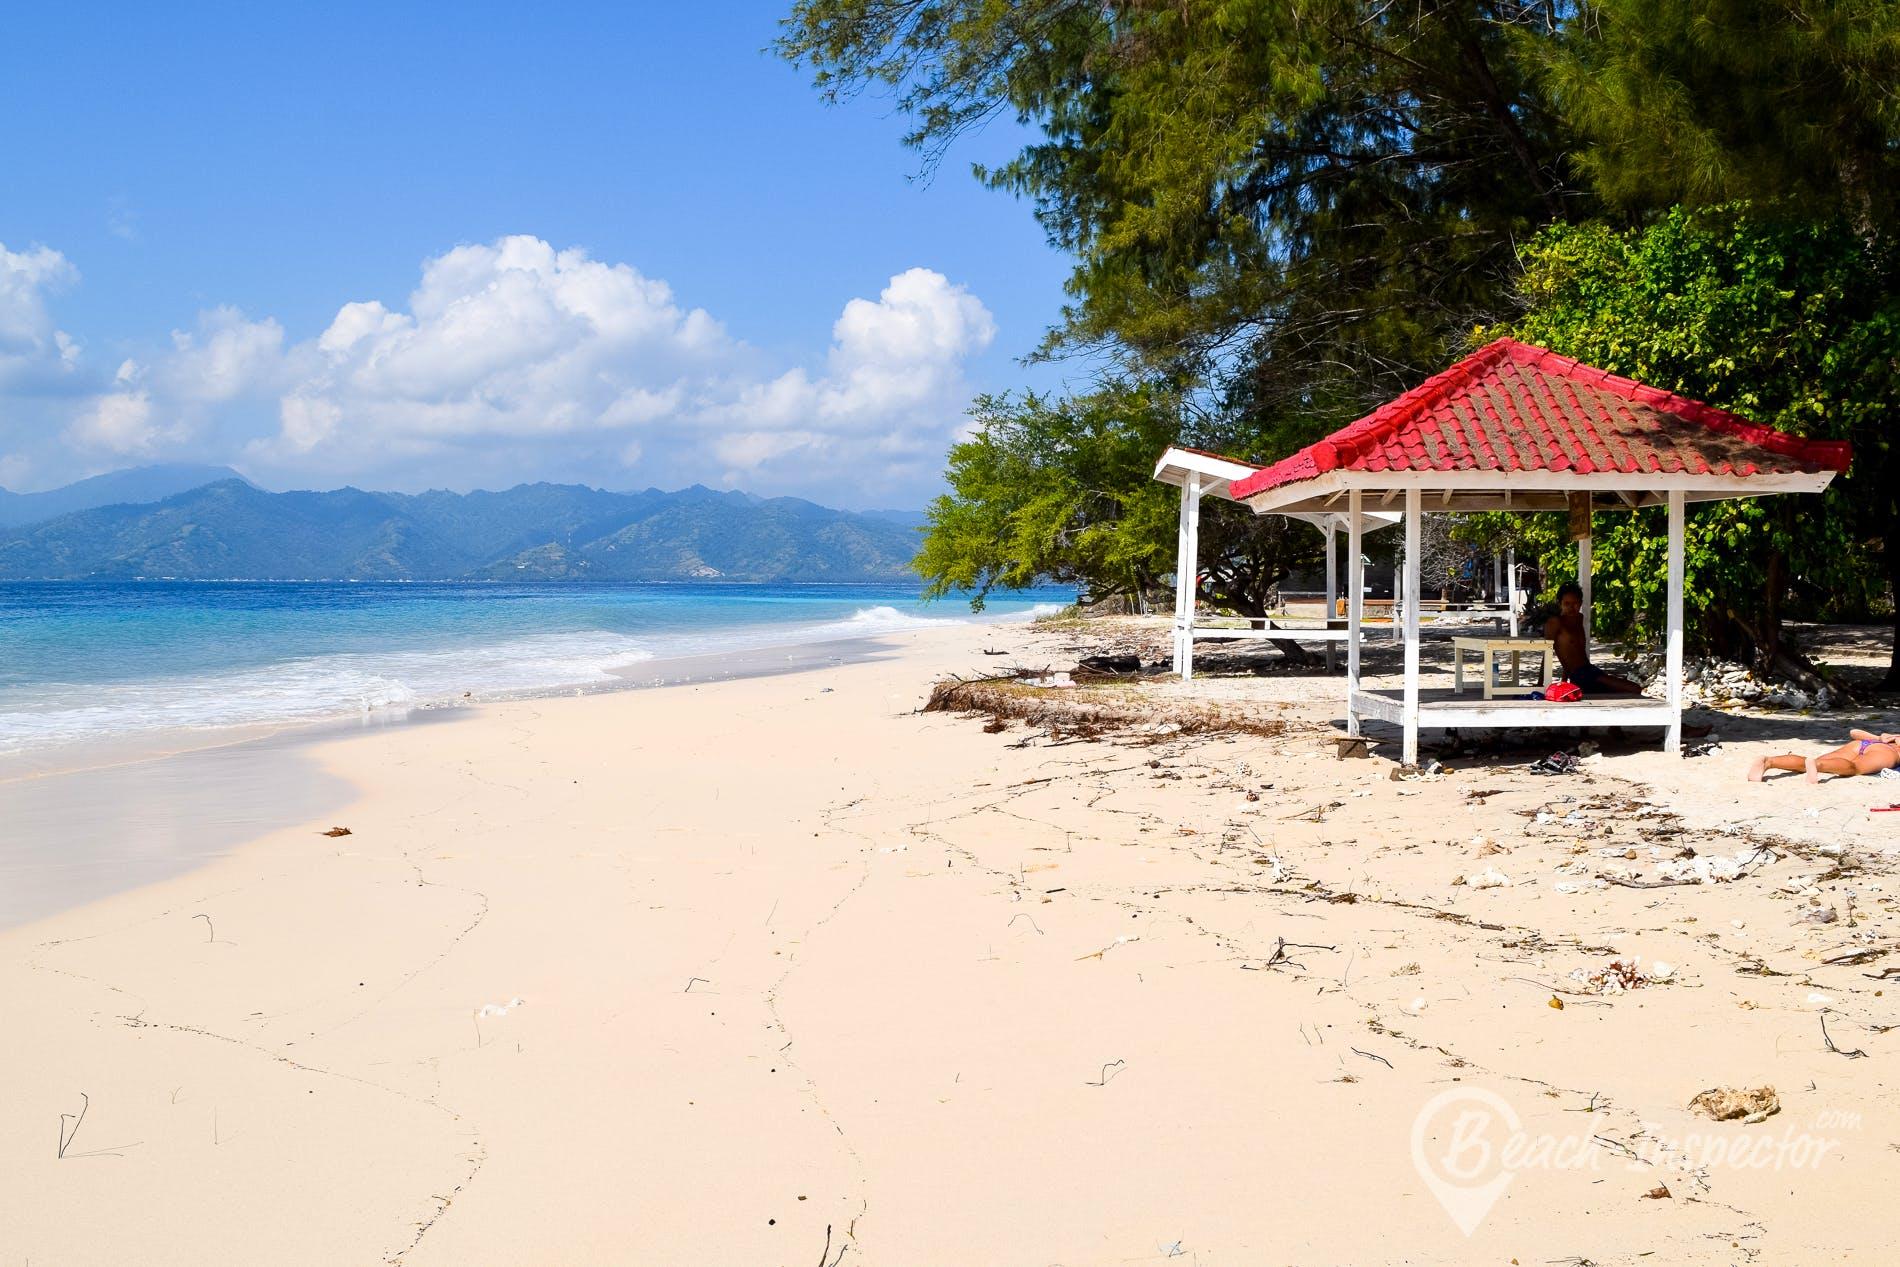 Beach Gili Meno, Gili Meno, Indonesia